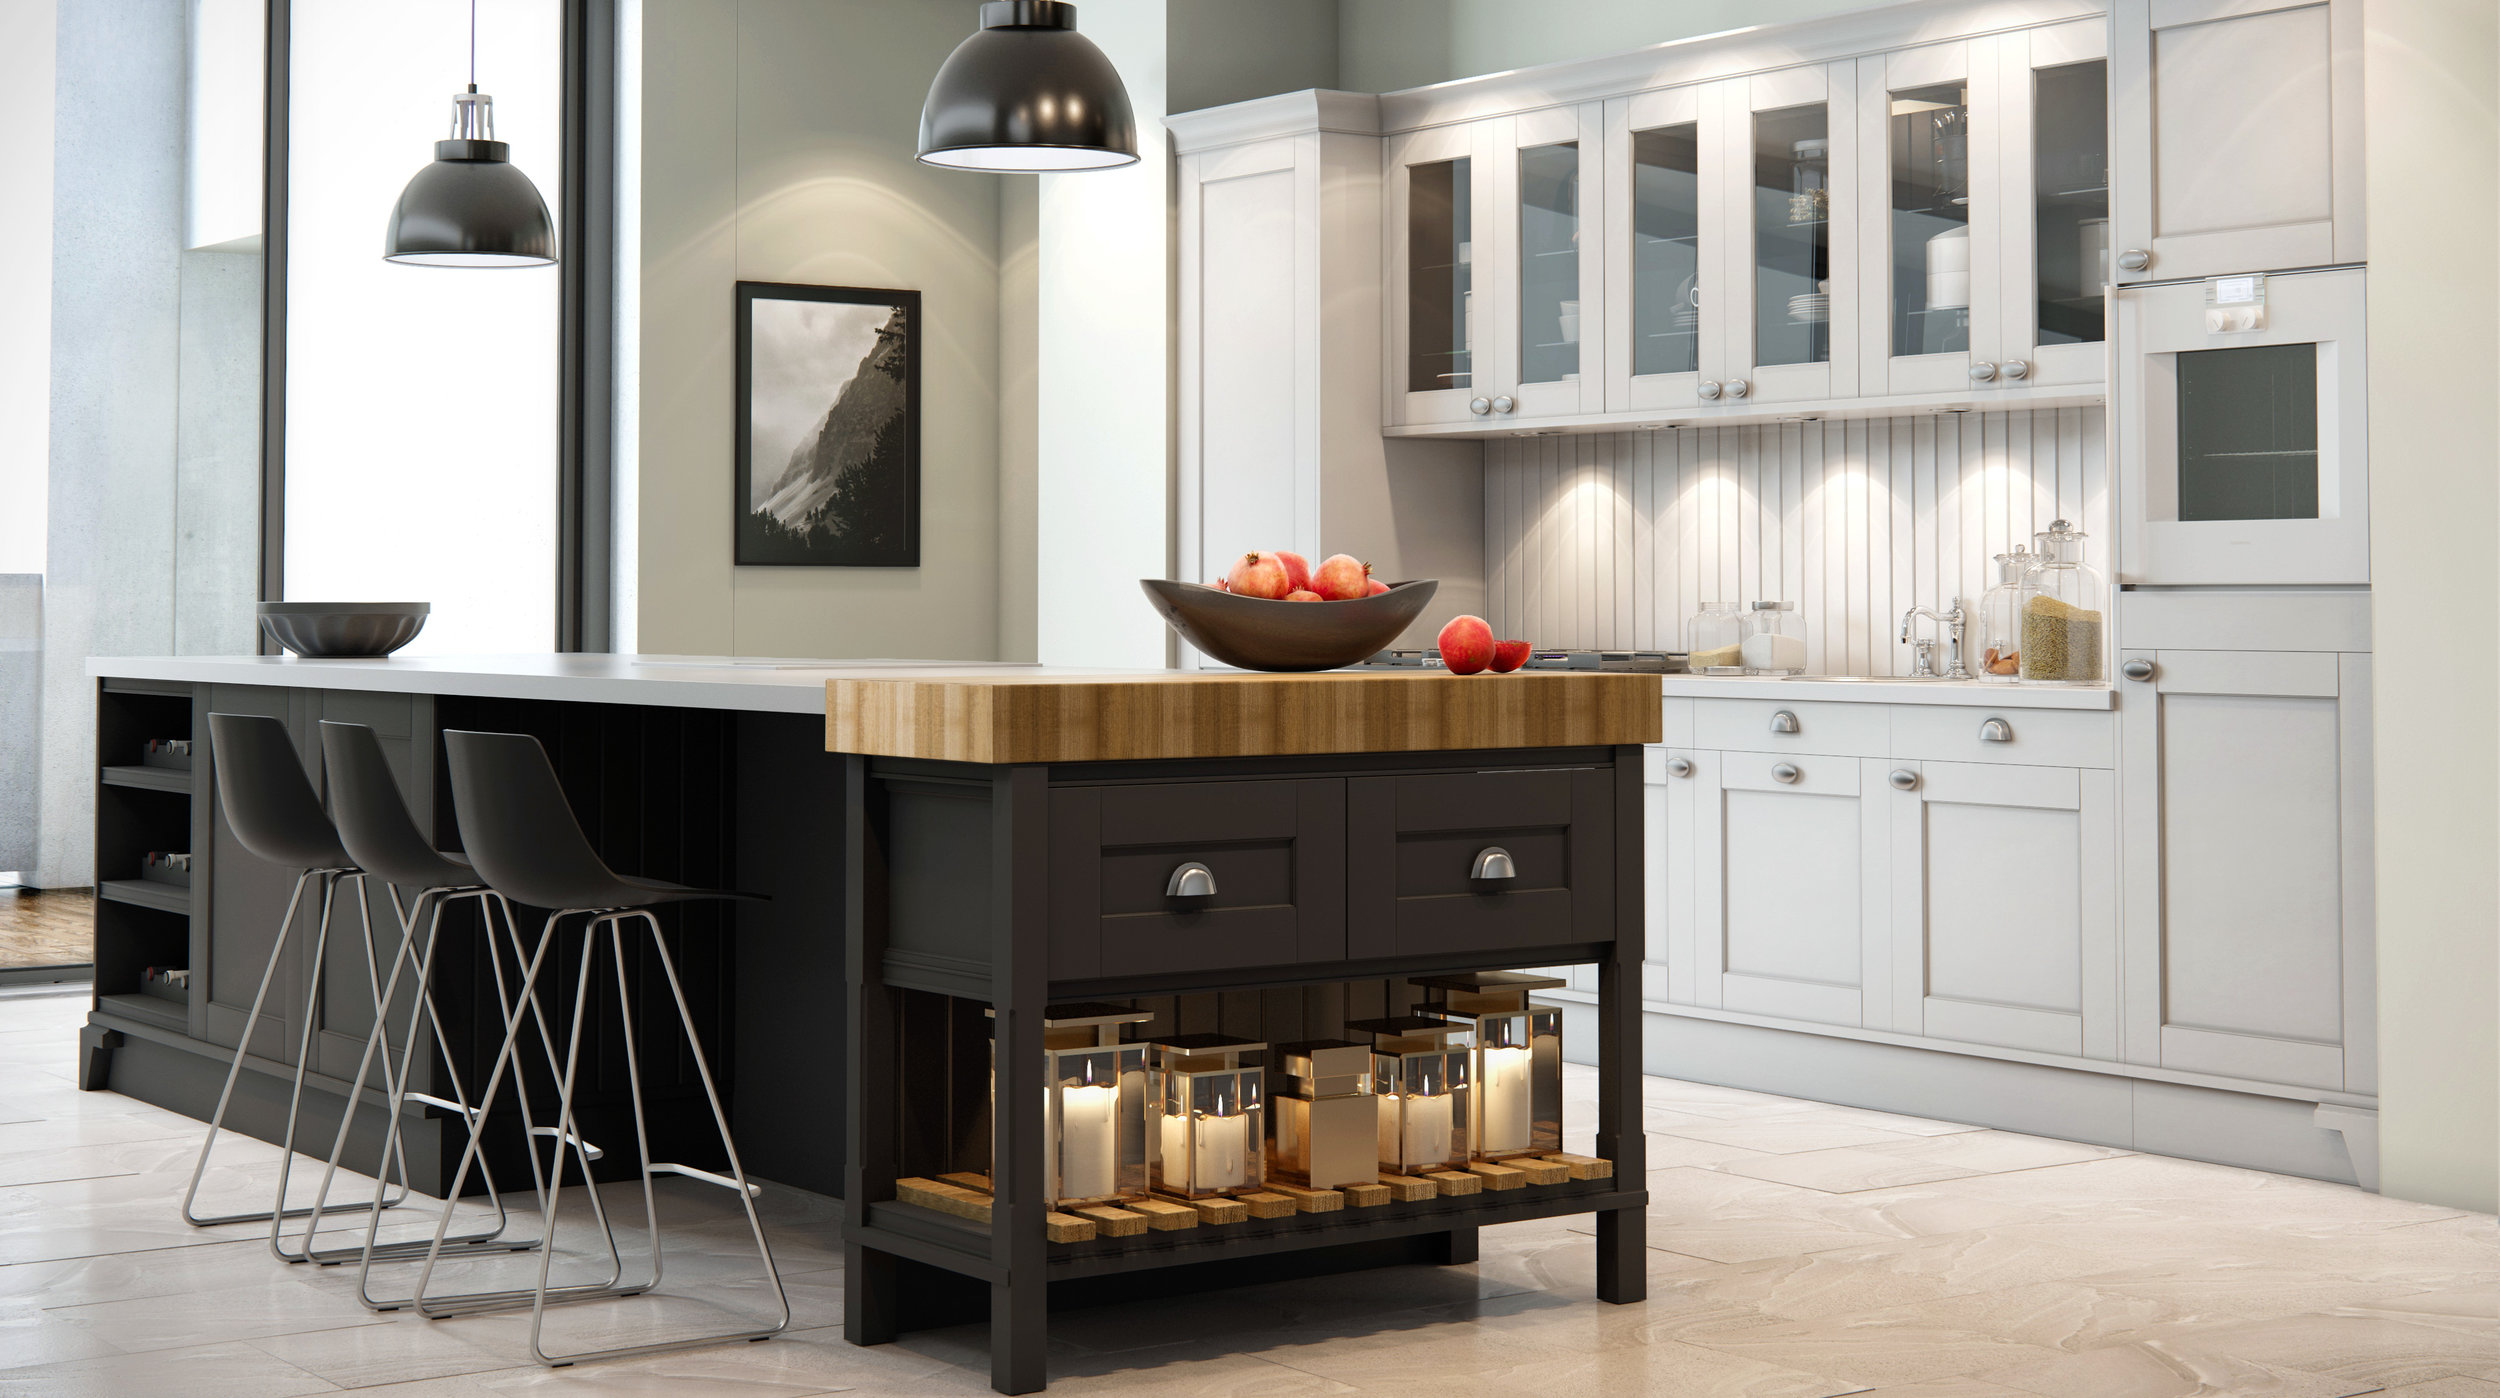 Low Res Kitchen CGI